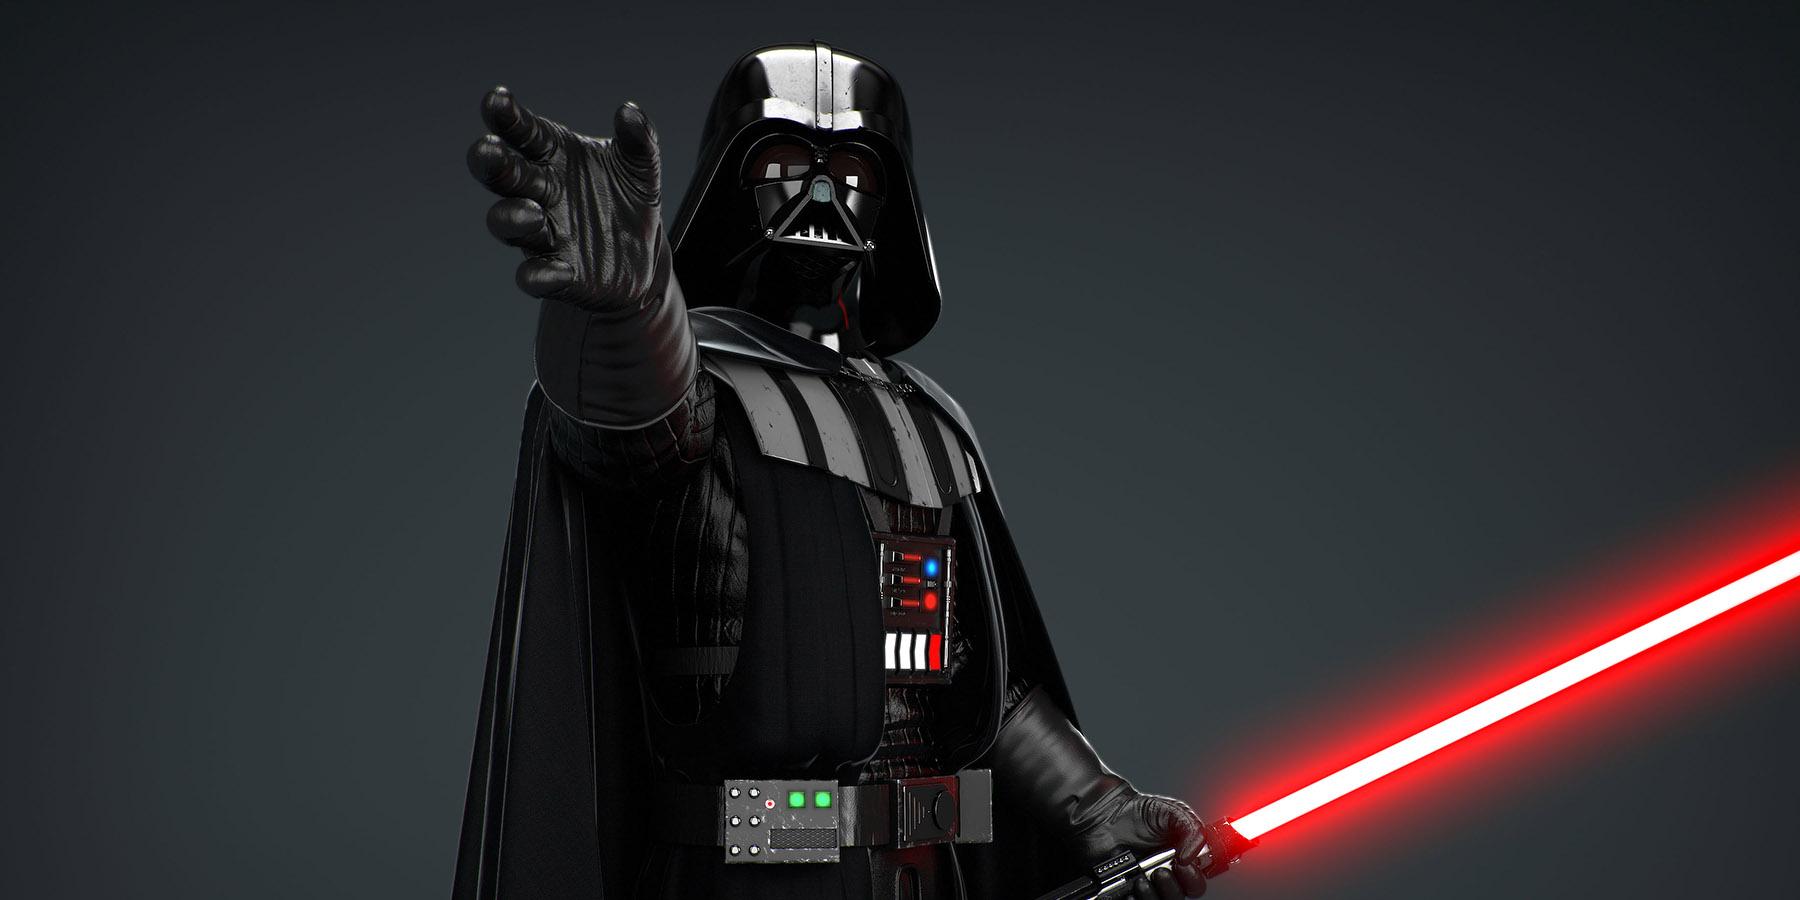 Darth Vader Wallpapers Humor Hq Darth Vader Pictures 4k